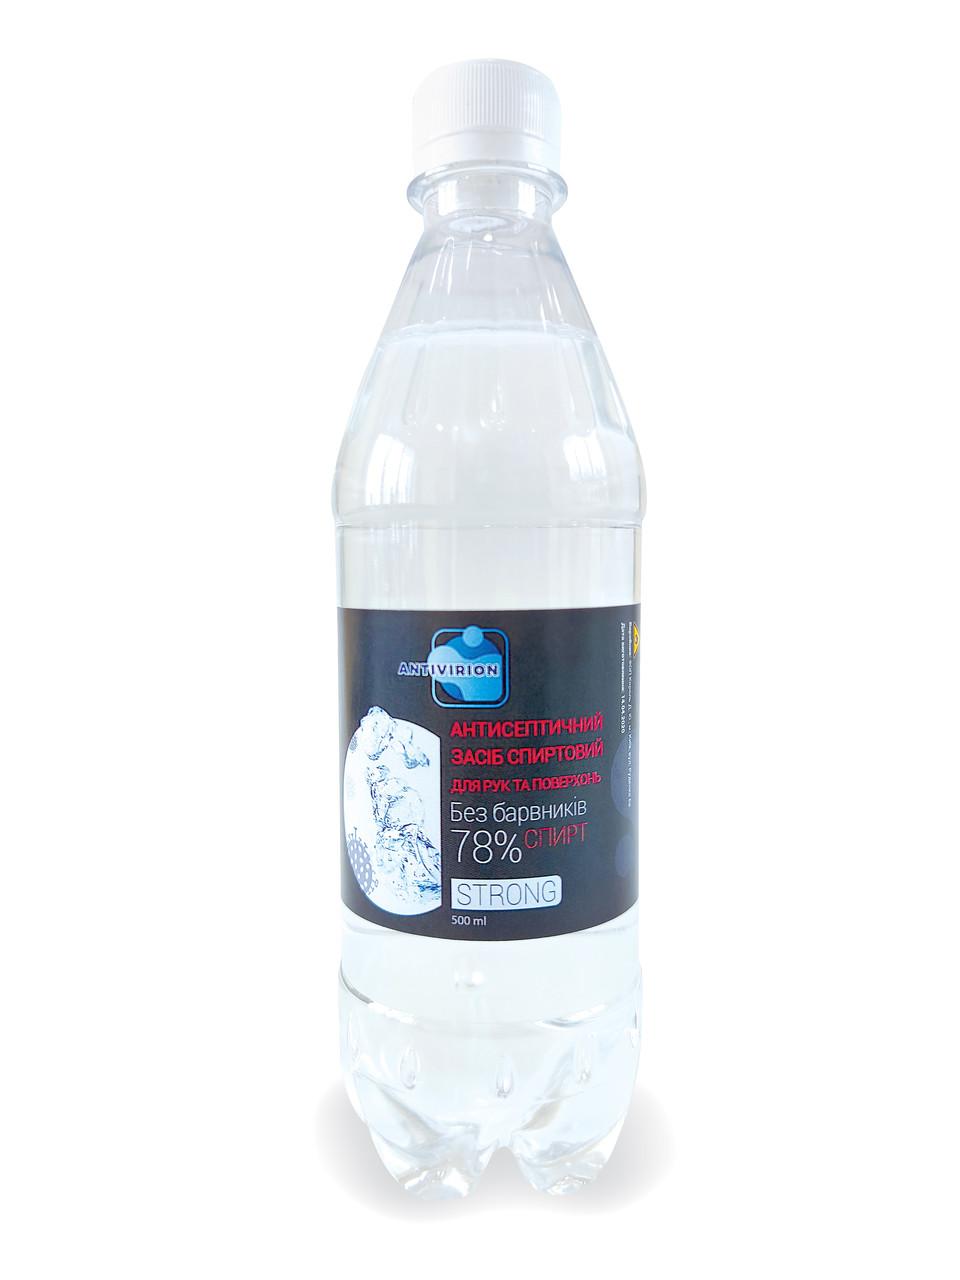 Антисептик 500 мл Antivirion Strong 78% санитайзер спиртовой для рук без запаха